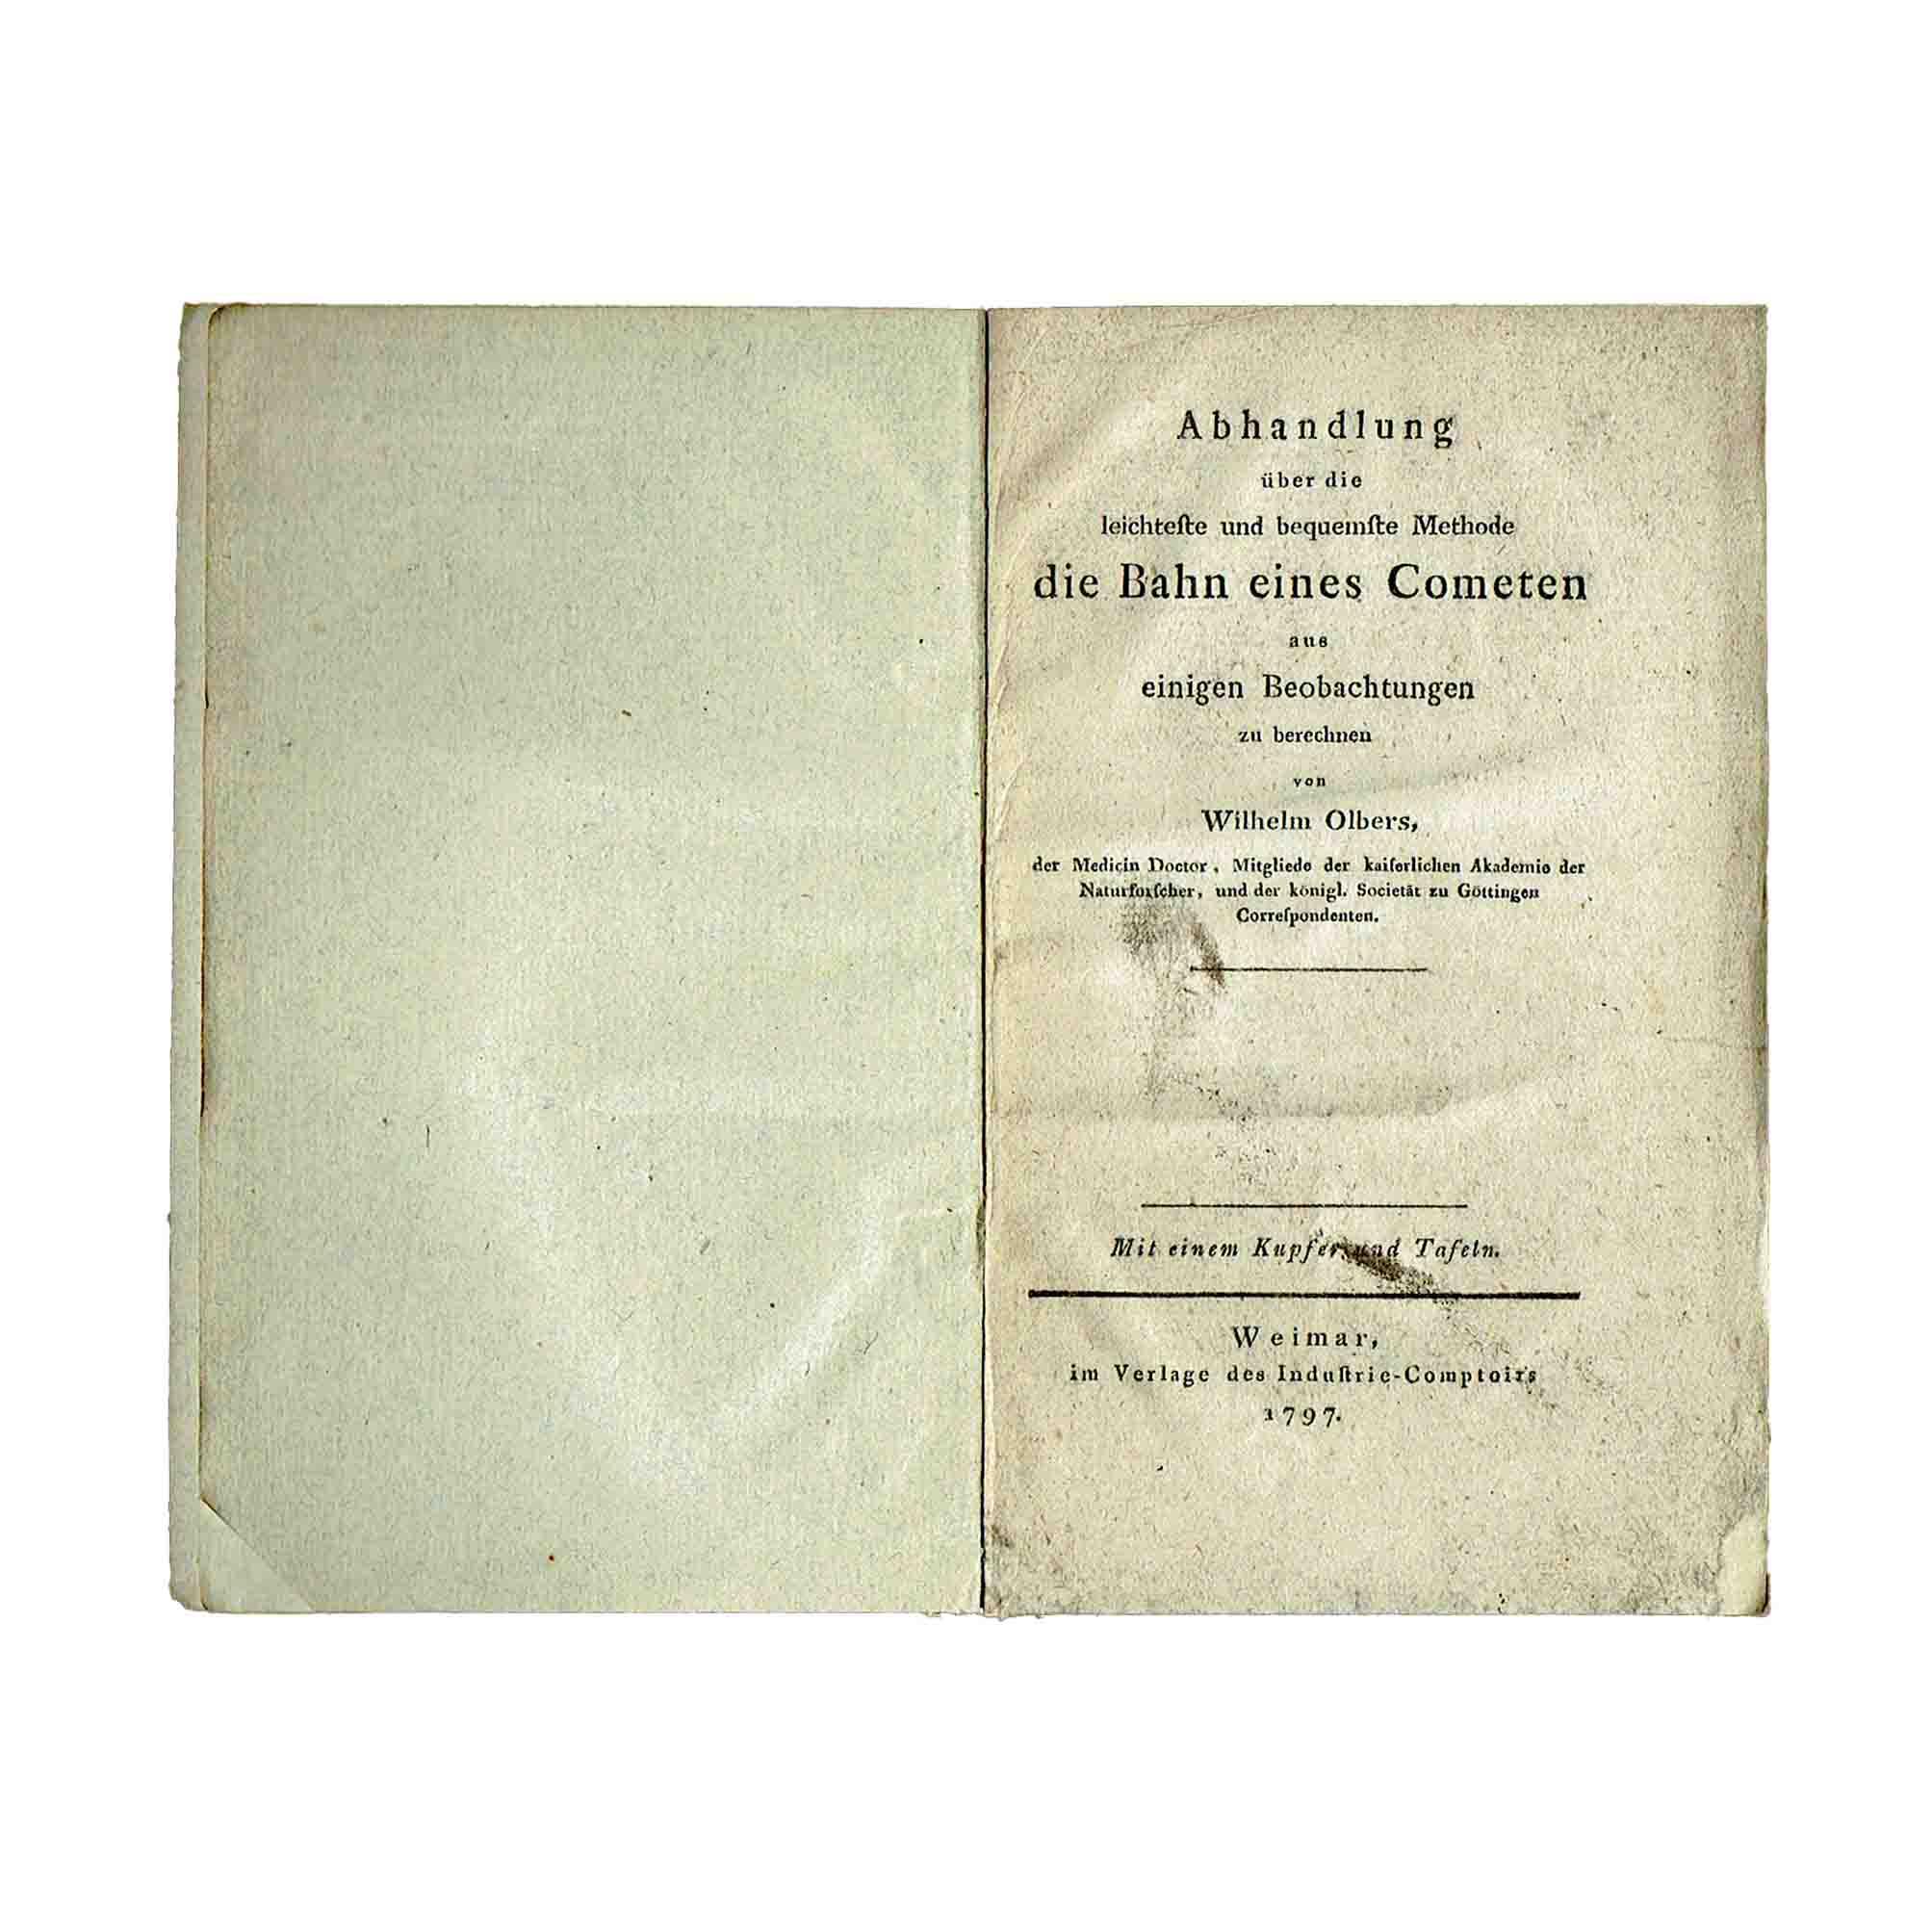 5906K-Olbers-Computing-Comets-Title-free-N.jpeg